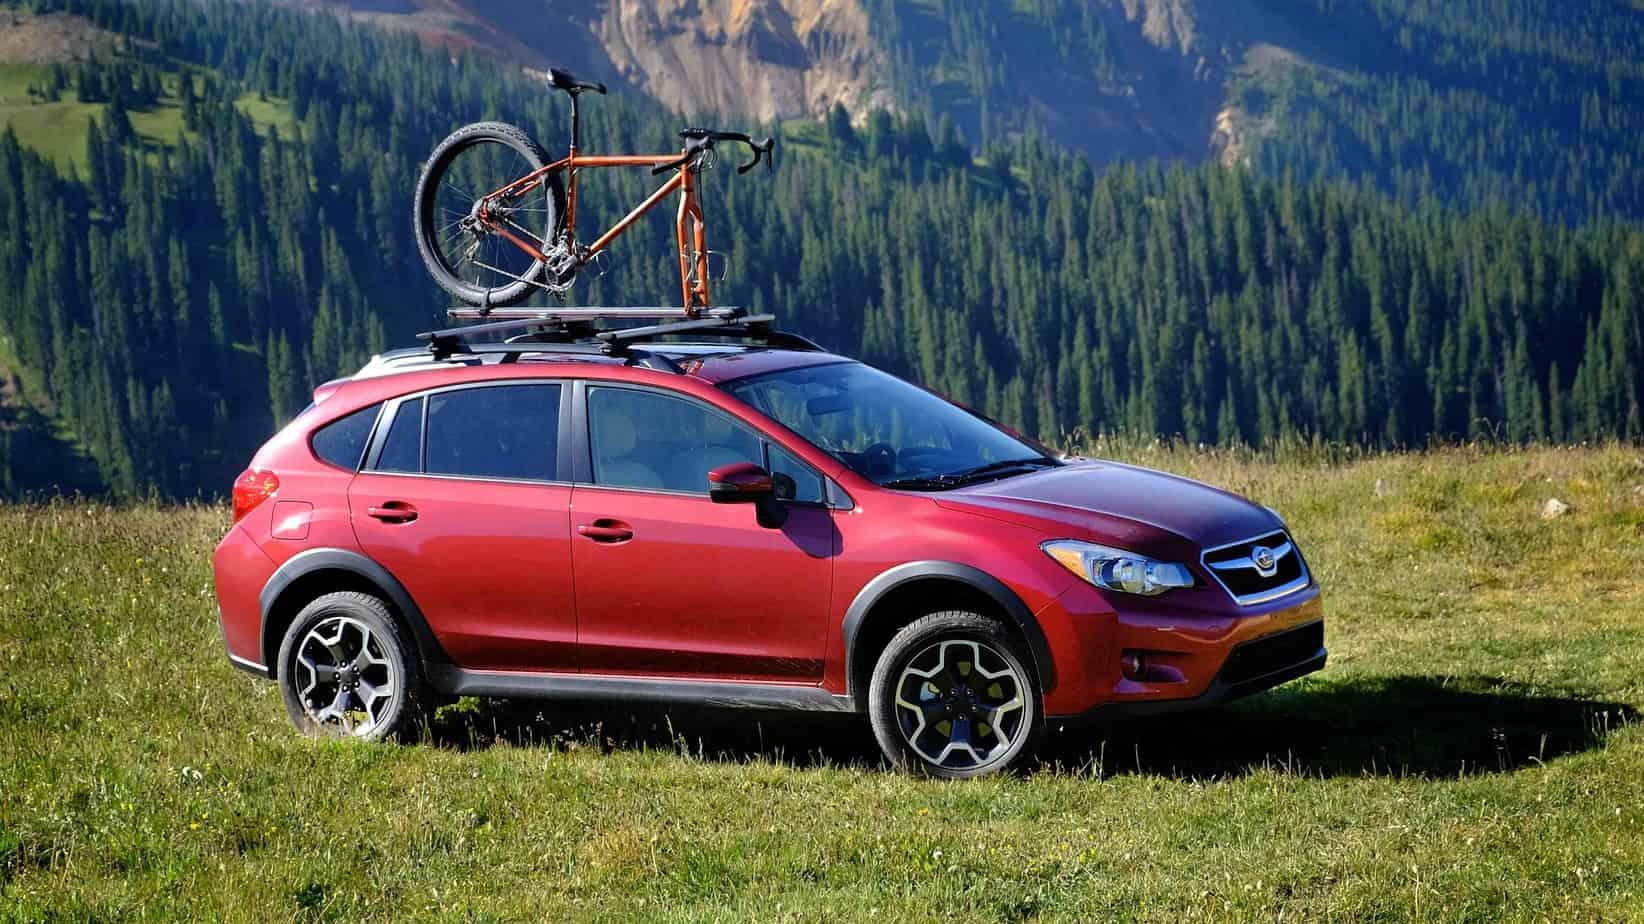 Road (And Trail) Tested: 2015 Subaru XV Crosstrek 2.0i Limited